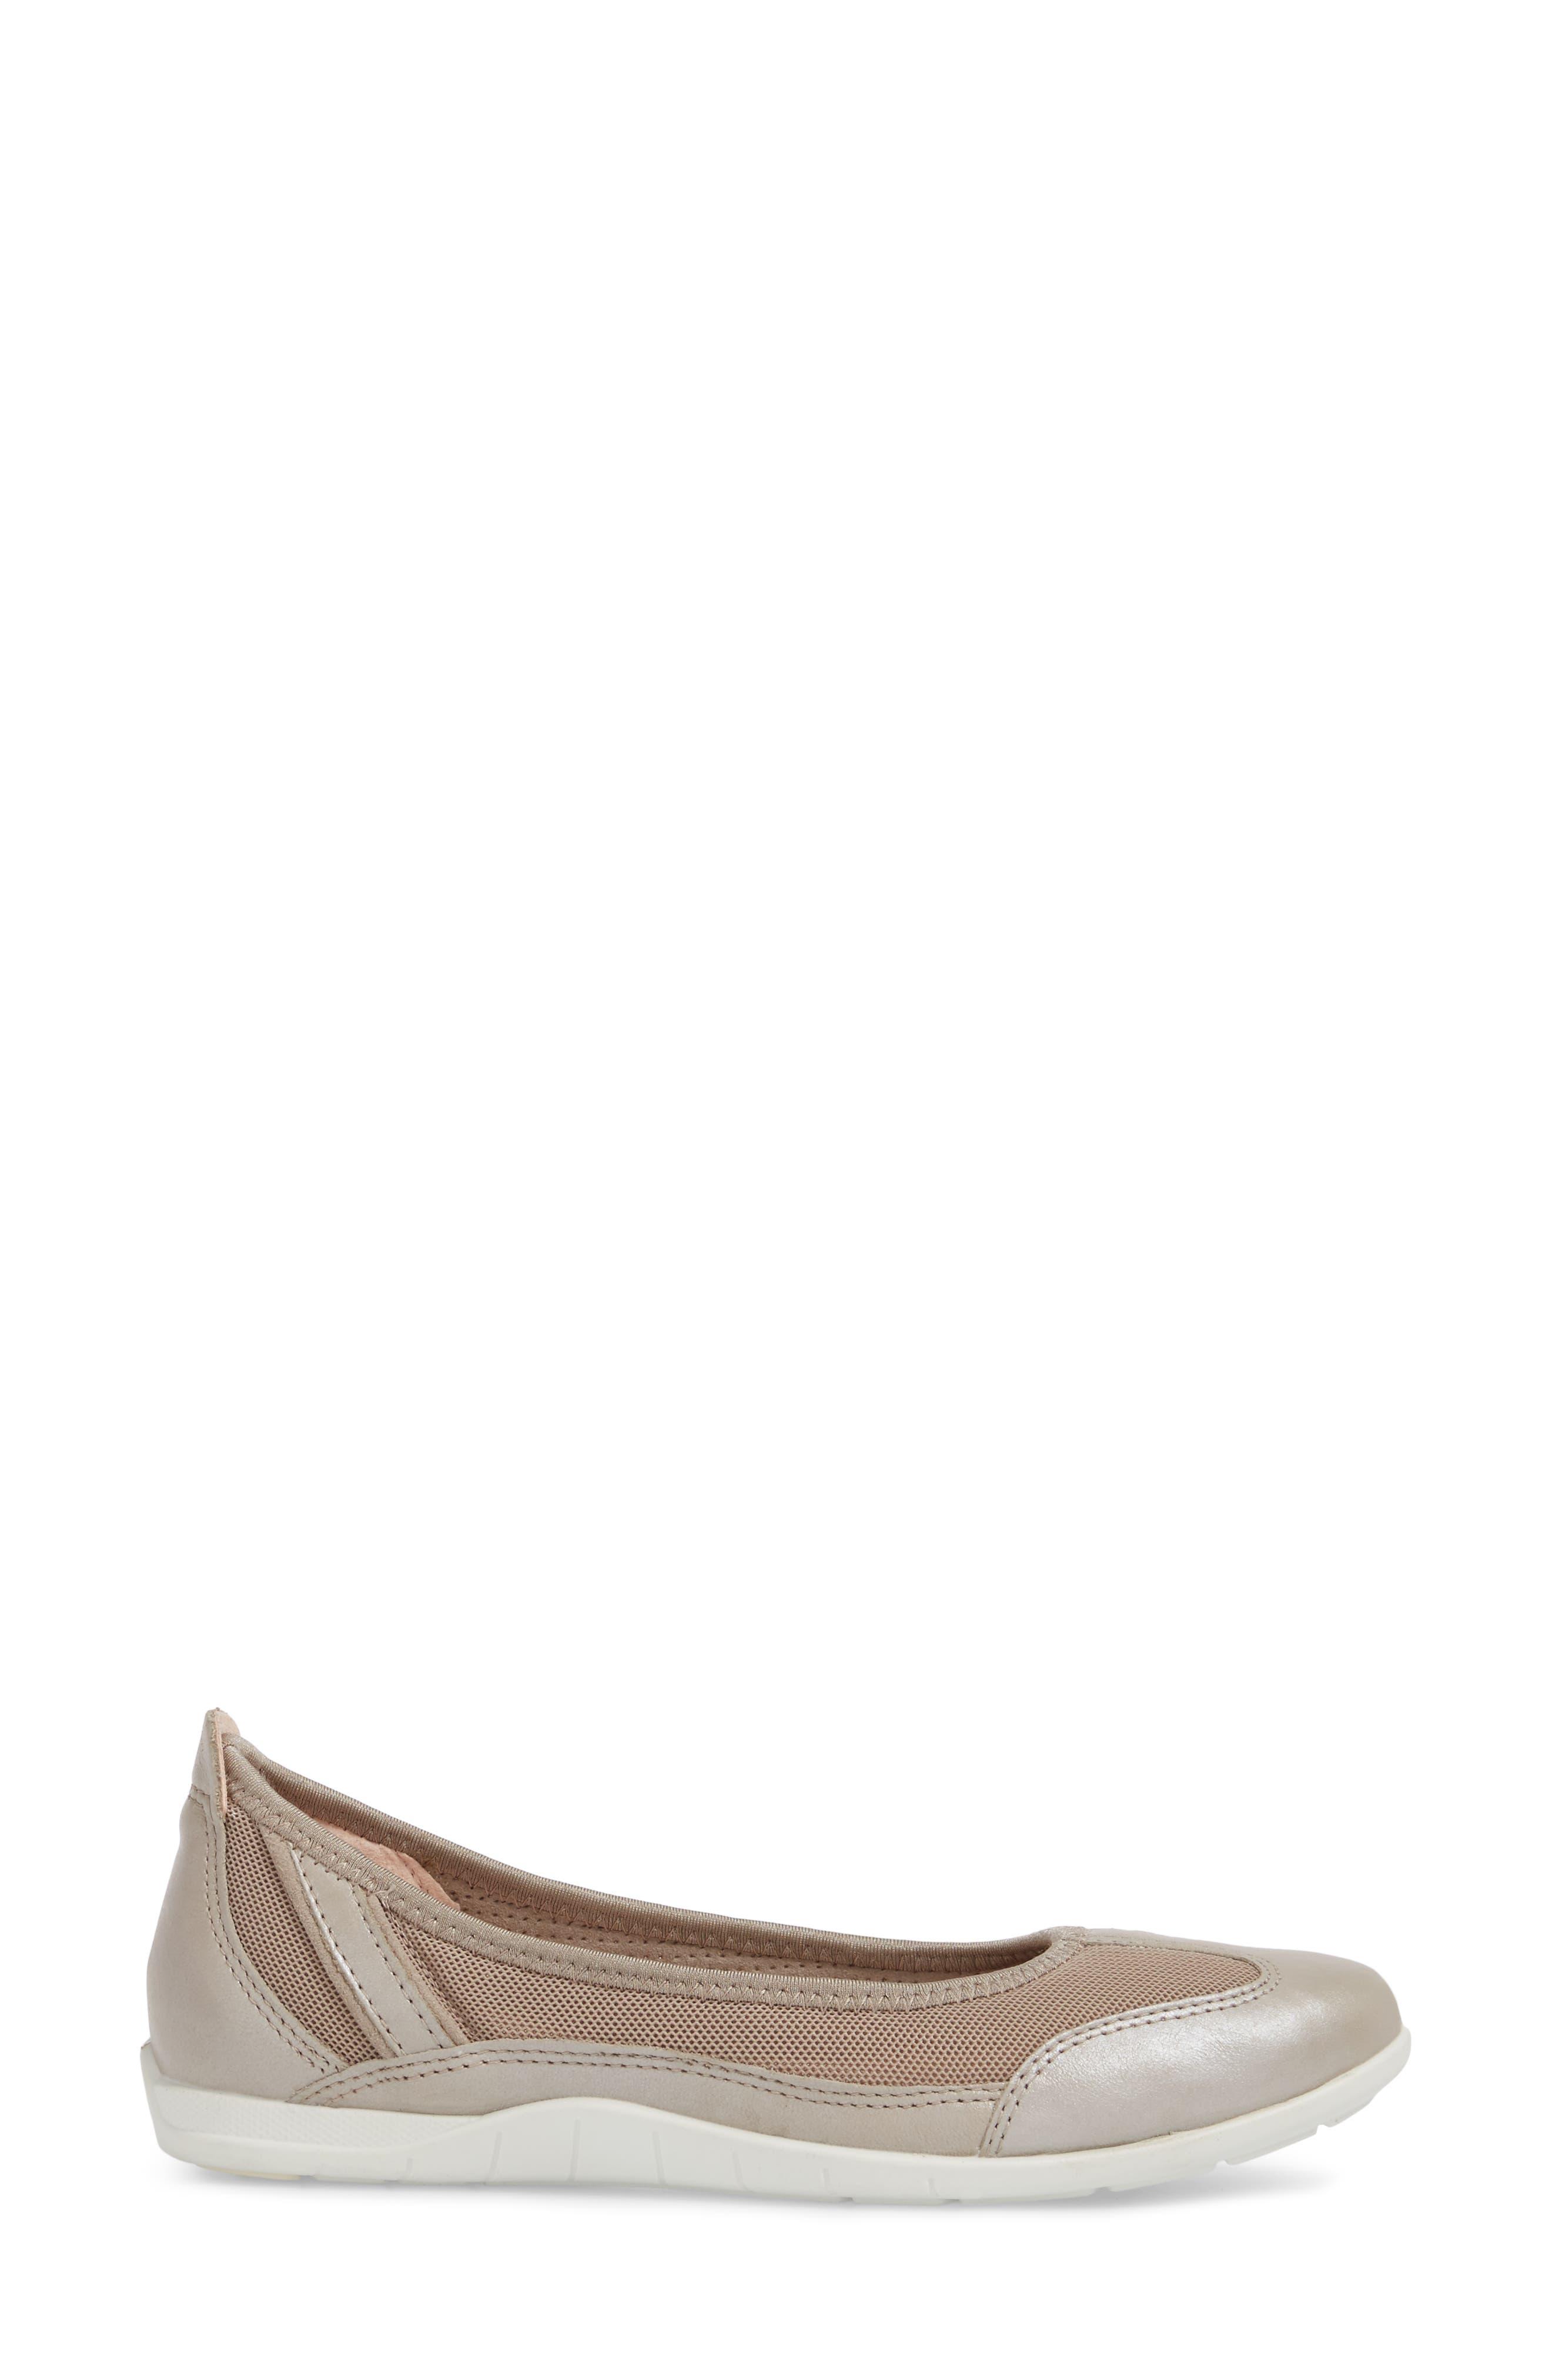 Alternate Image 3  - ECCO 'Bluma' Ballet Sneaker (Women)